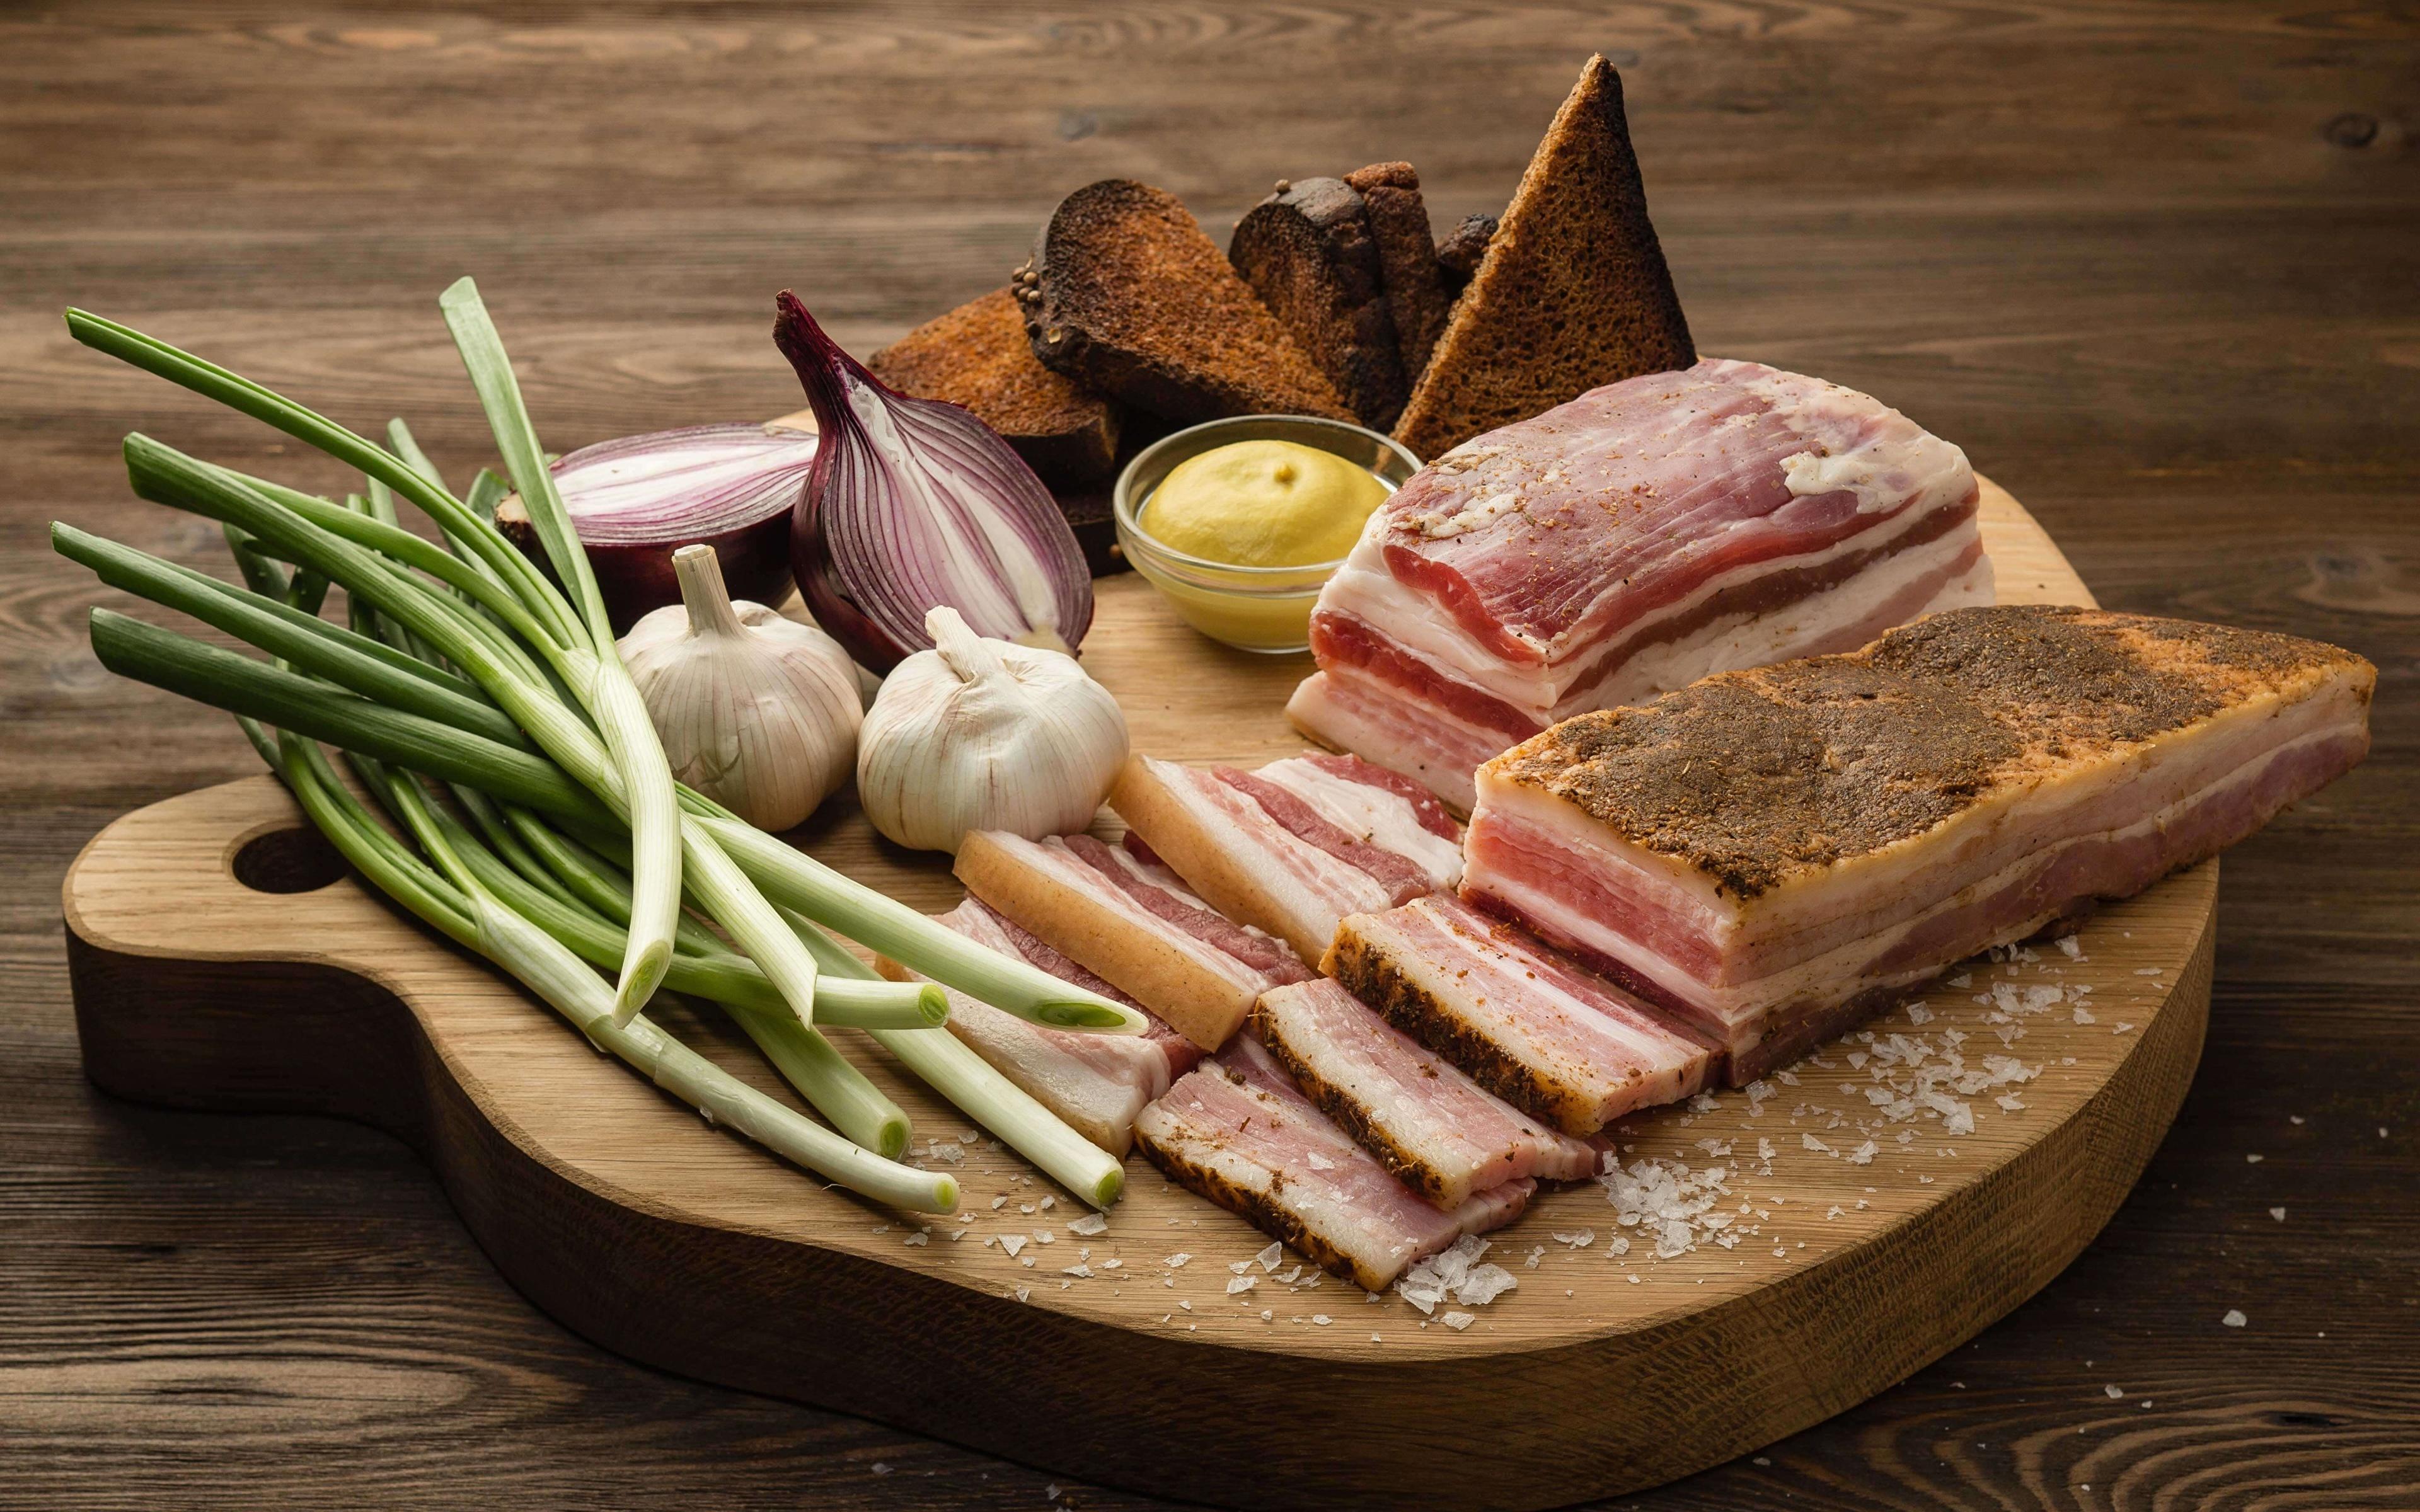 Onion_Garlic_Salo_Food_550049_3840x2400